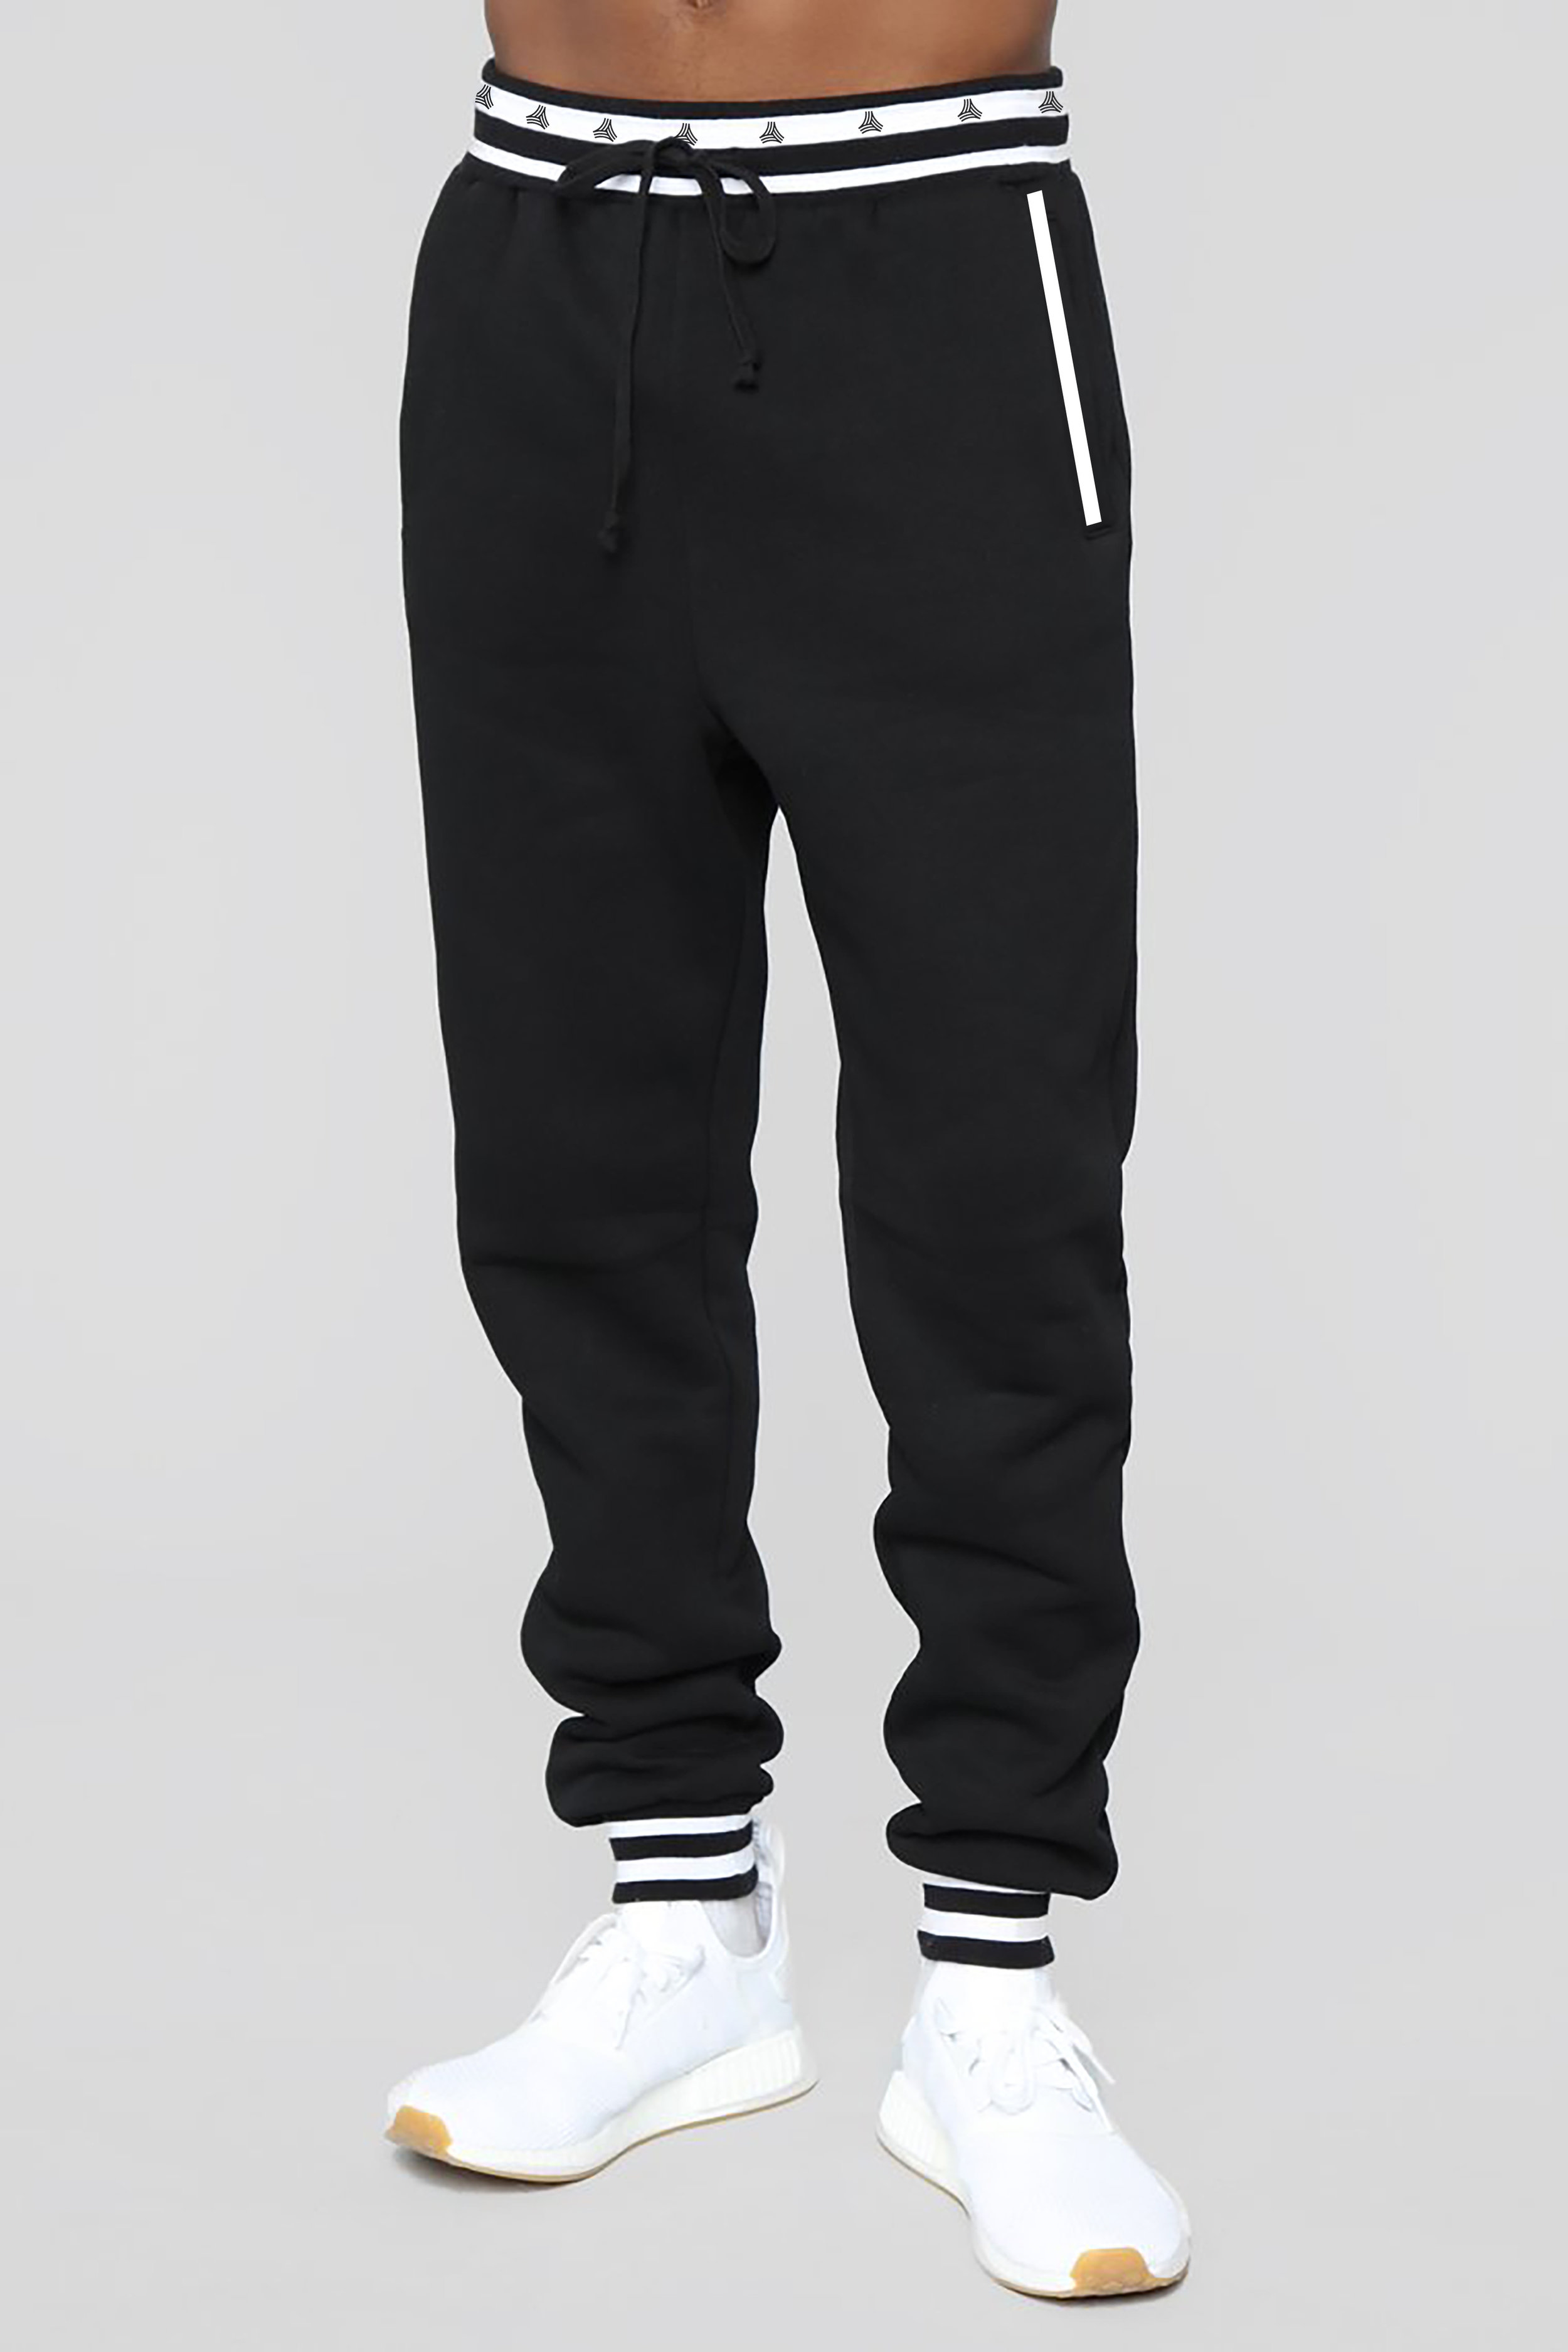 Adidas Tango_Pant Design_2019_Option9.jpg